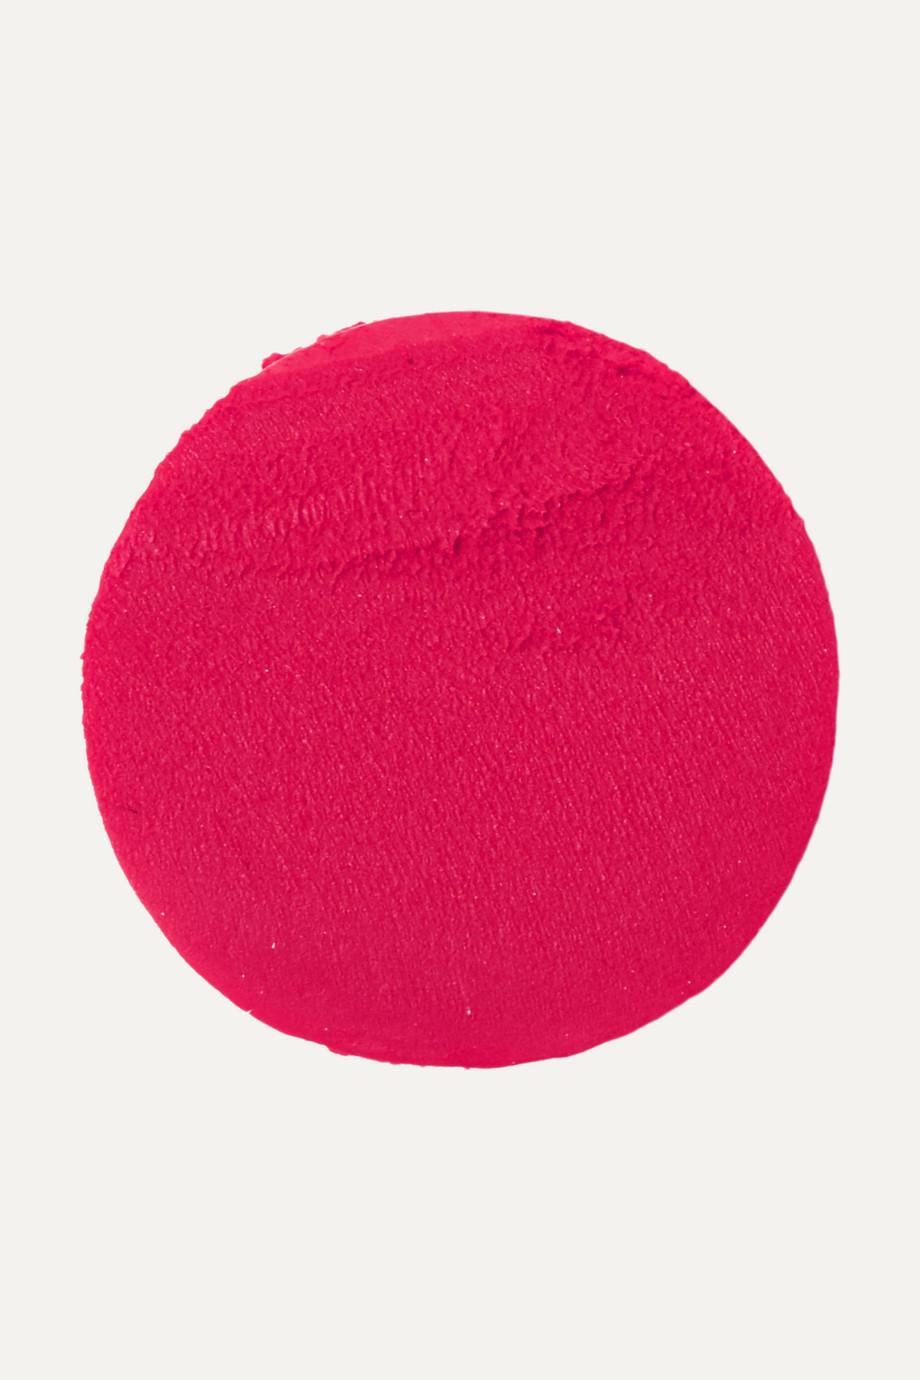 Code8 Matte Velour Lipstick - Mambo